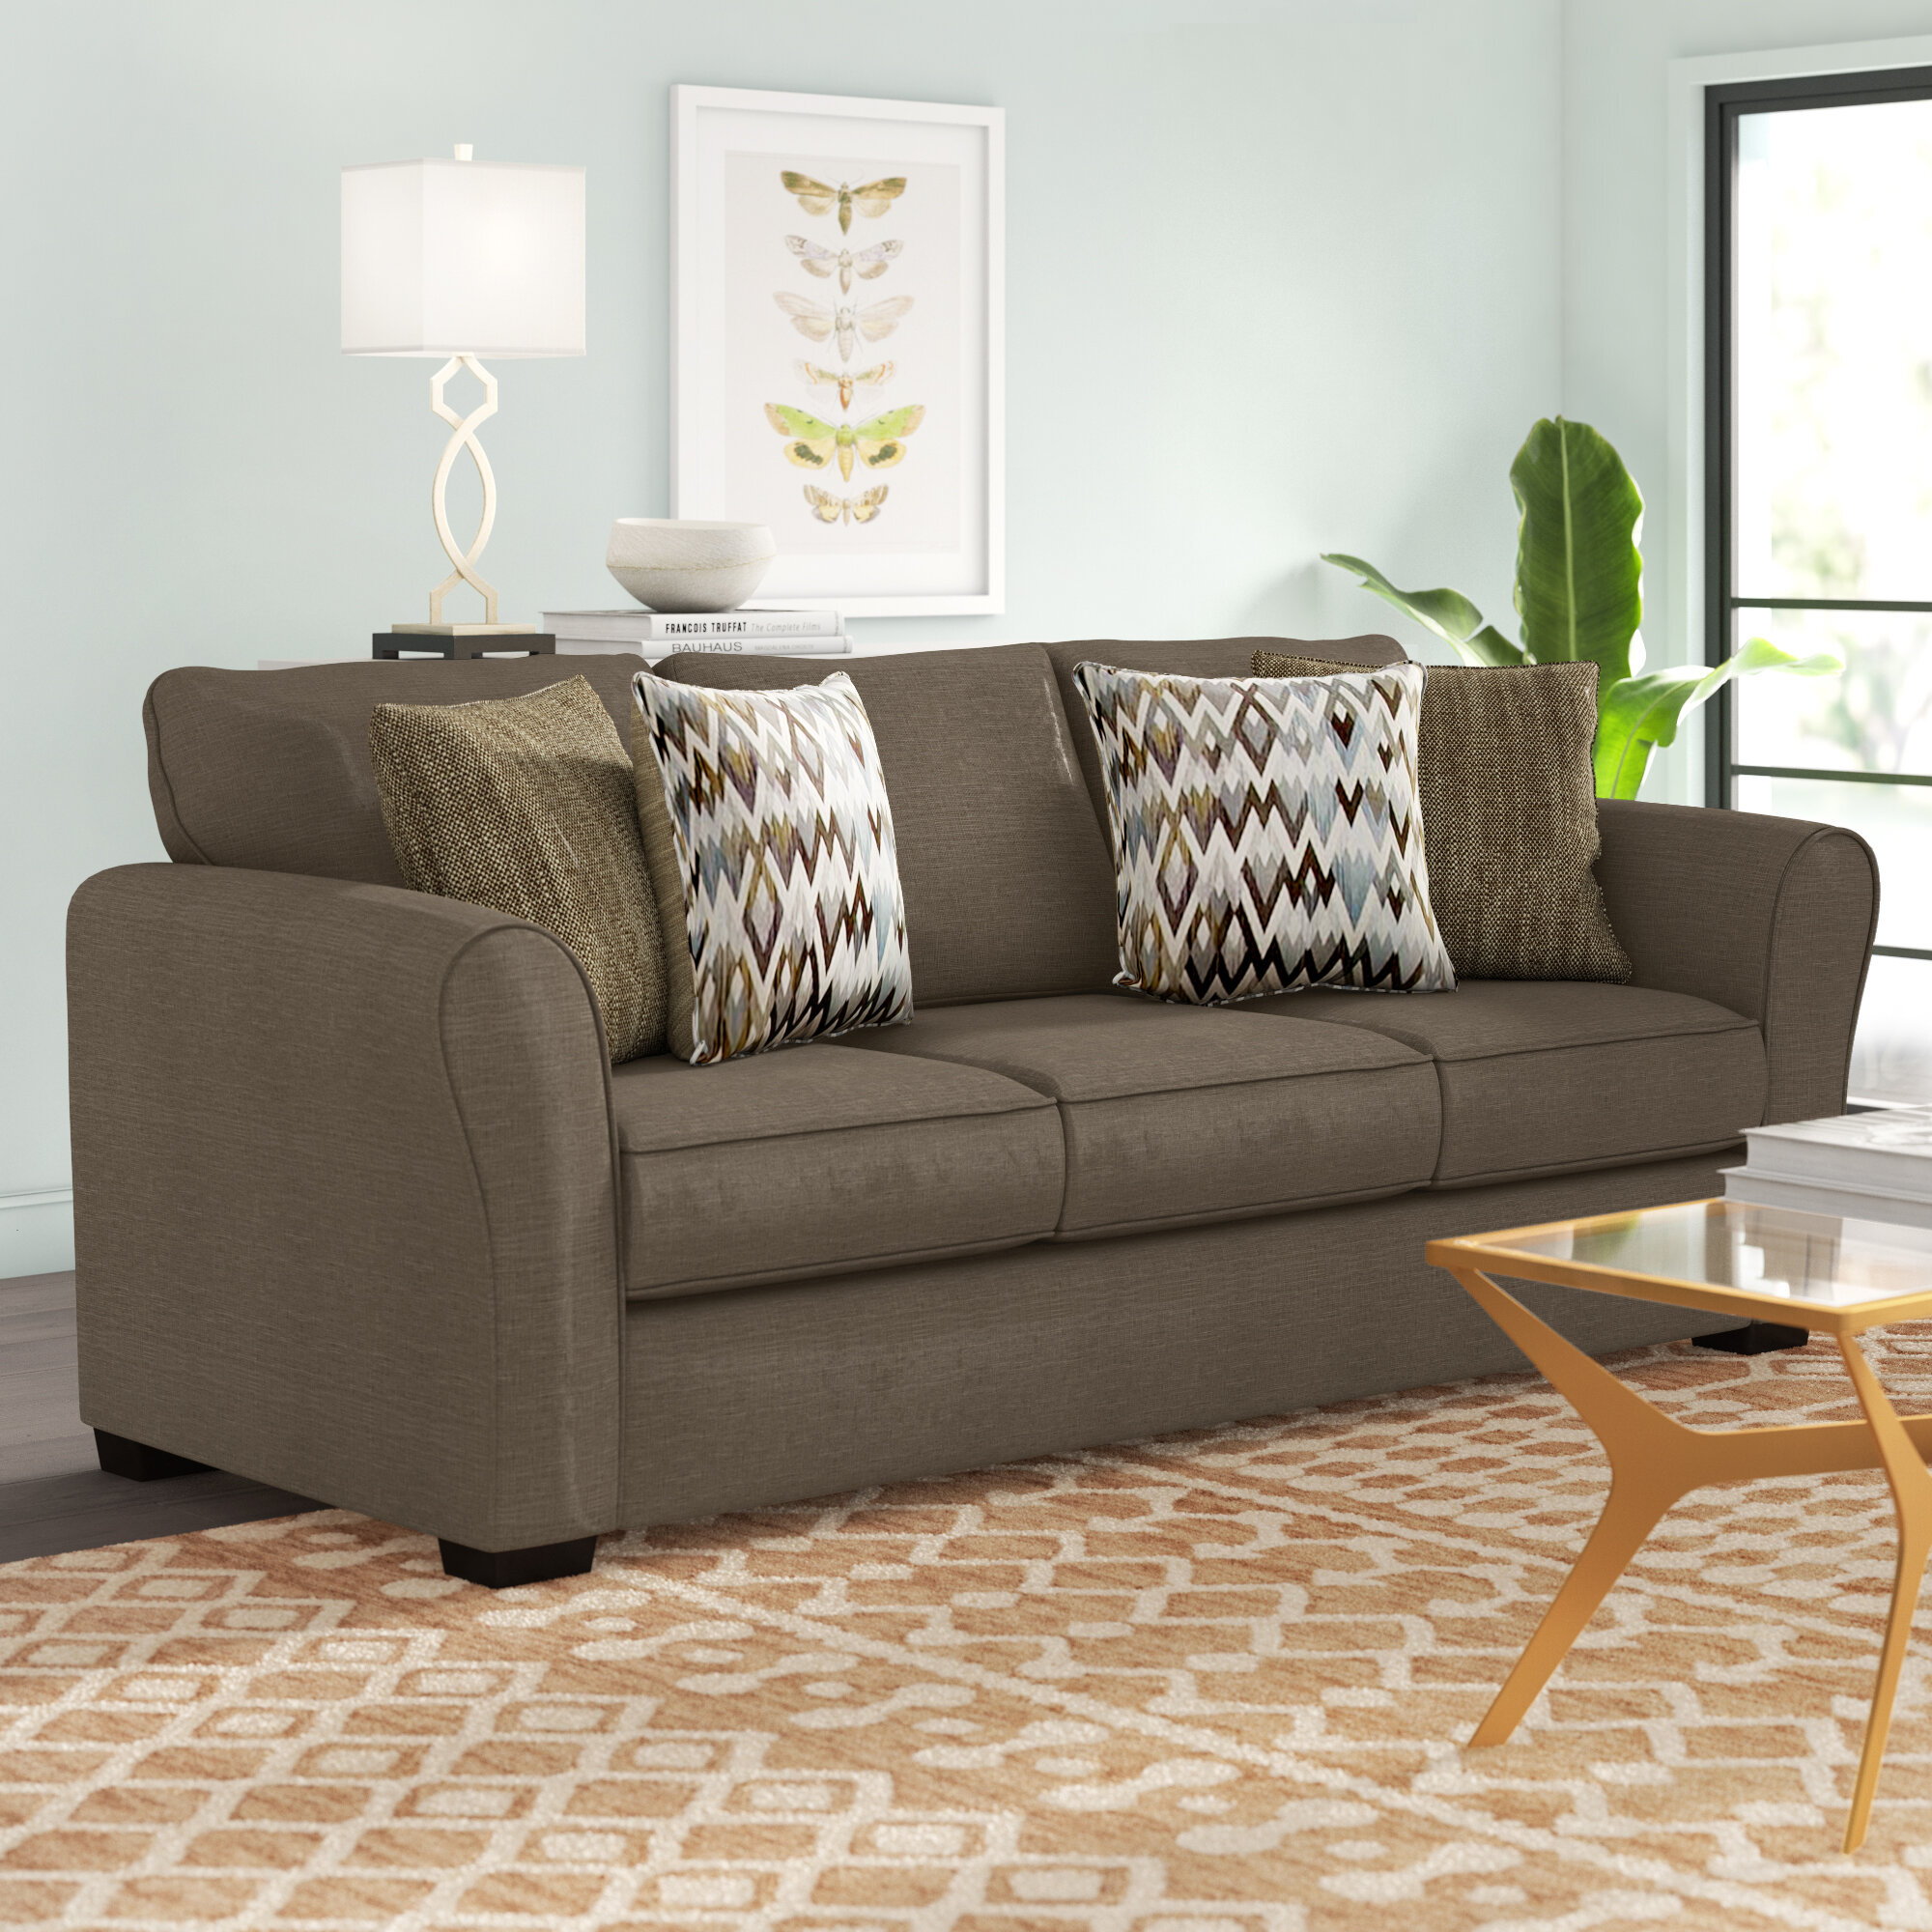 Pleasing Alcott Hill Derry Sofa Bed Reviews Wayfair Unemploymentrelief Wooden Chair Designs For Living Room Unemploymentrelieforg